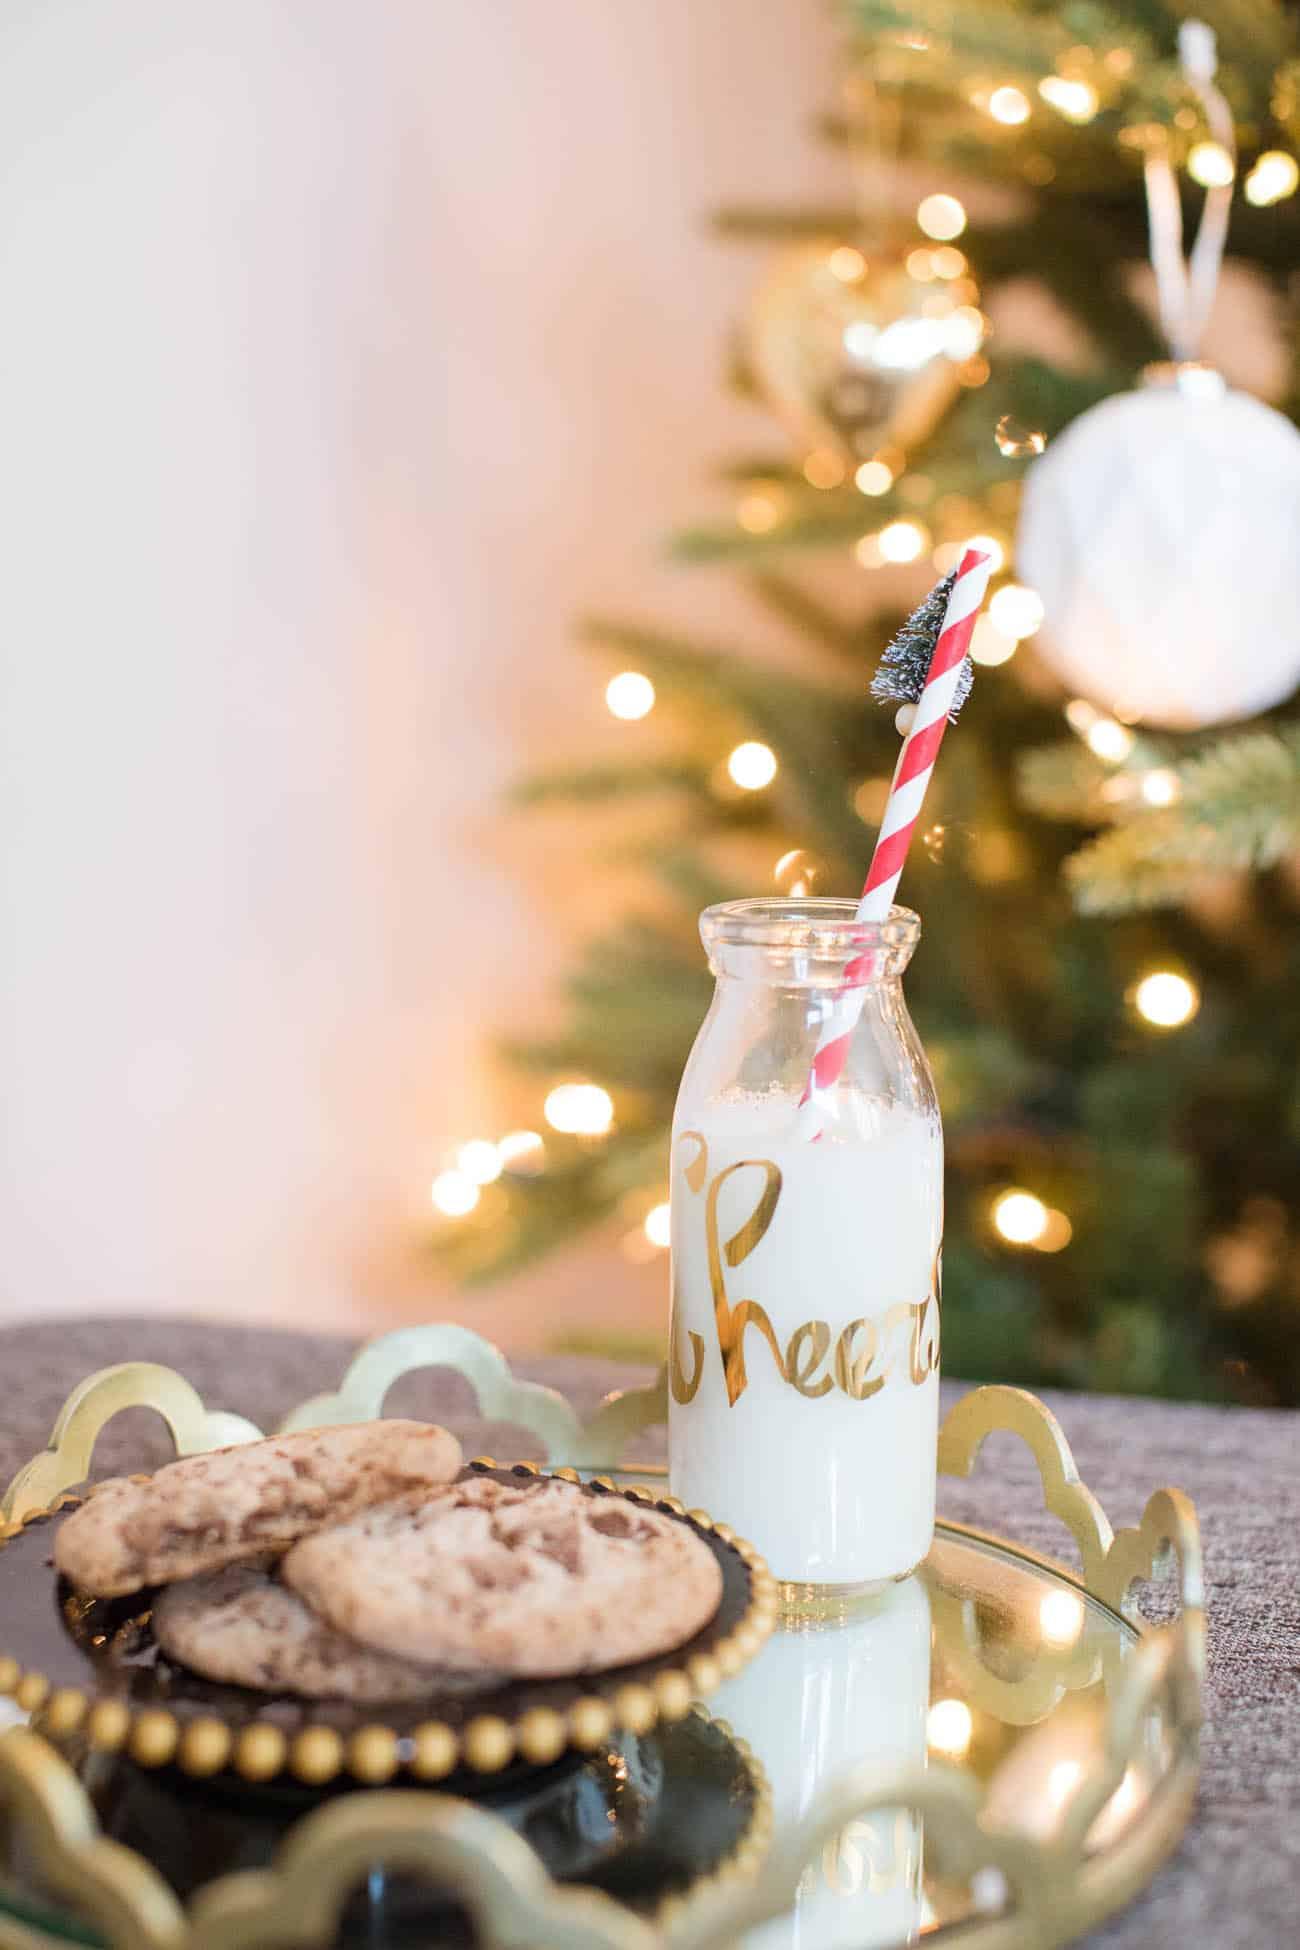 holiday decorating ideas, cookies for santa, christmas ideas - My Style Vita @mystyleivta